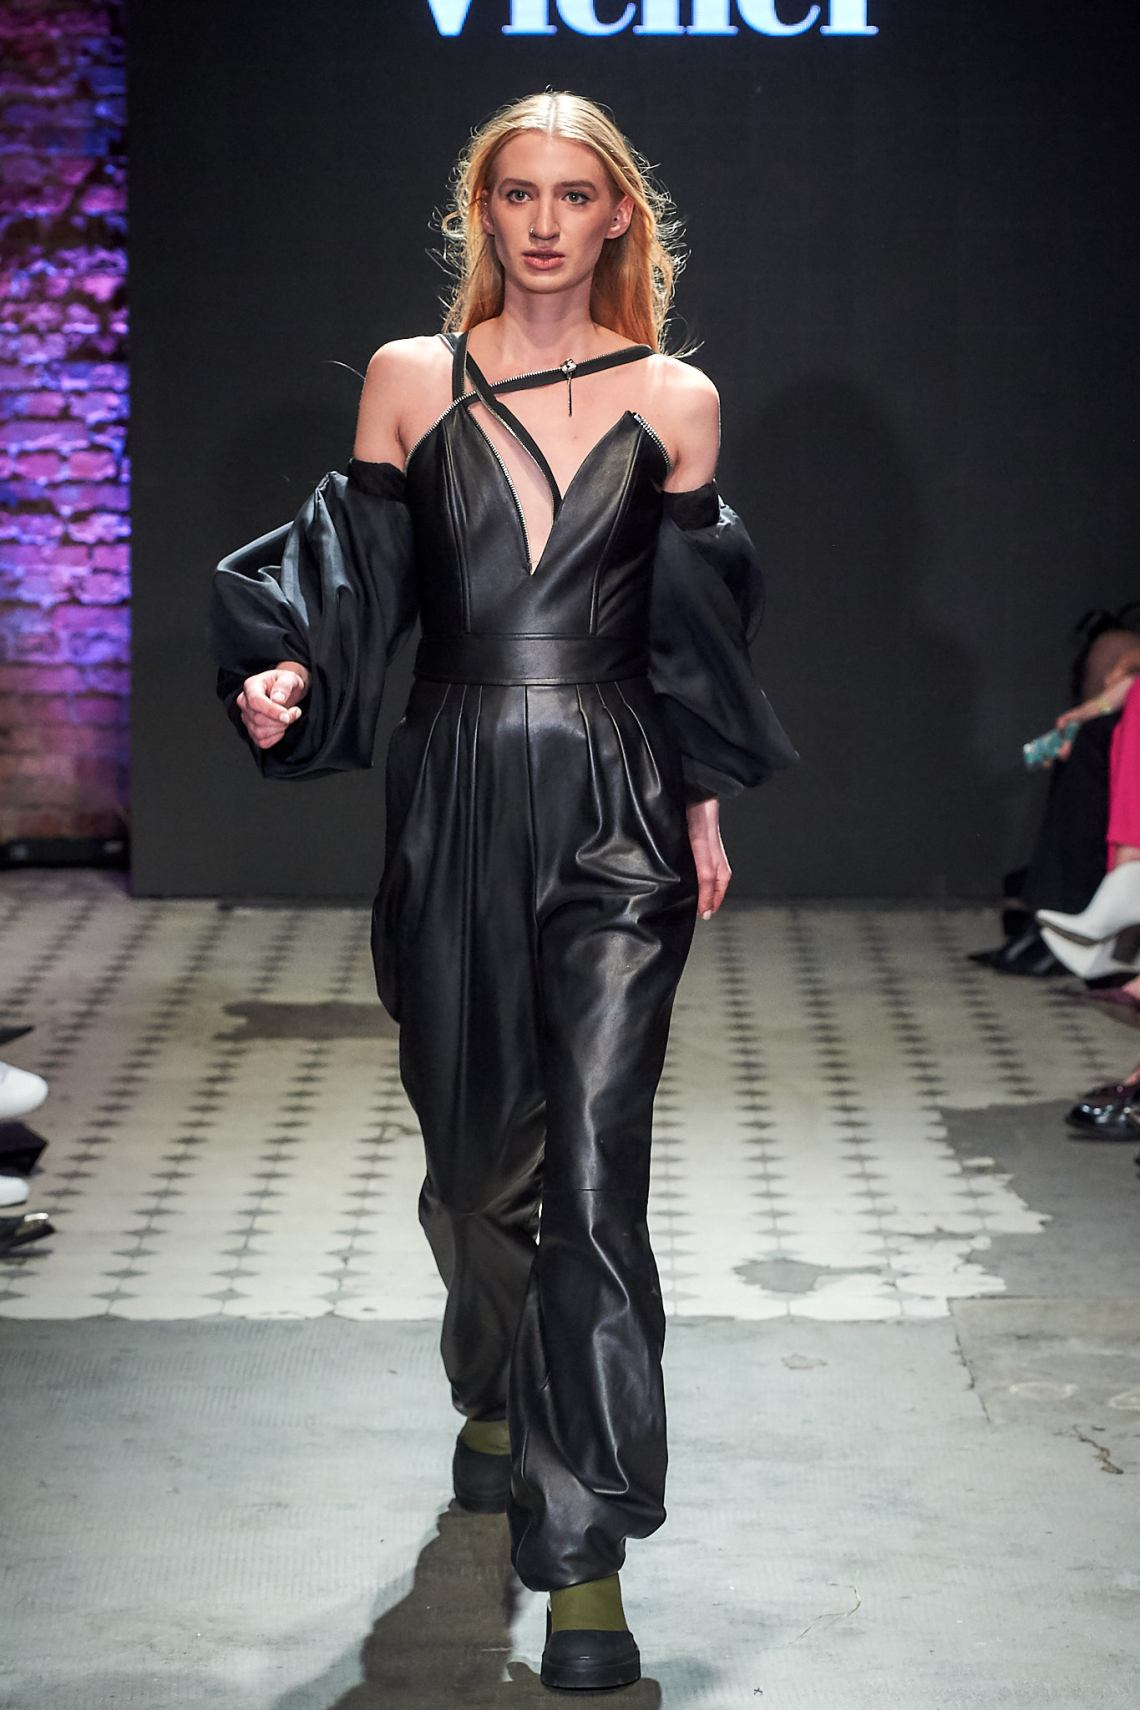 5_KTW_DAY2_121019_VICHER_lowres-fotFilipOkopny-FashionImages